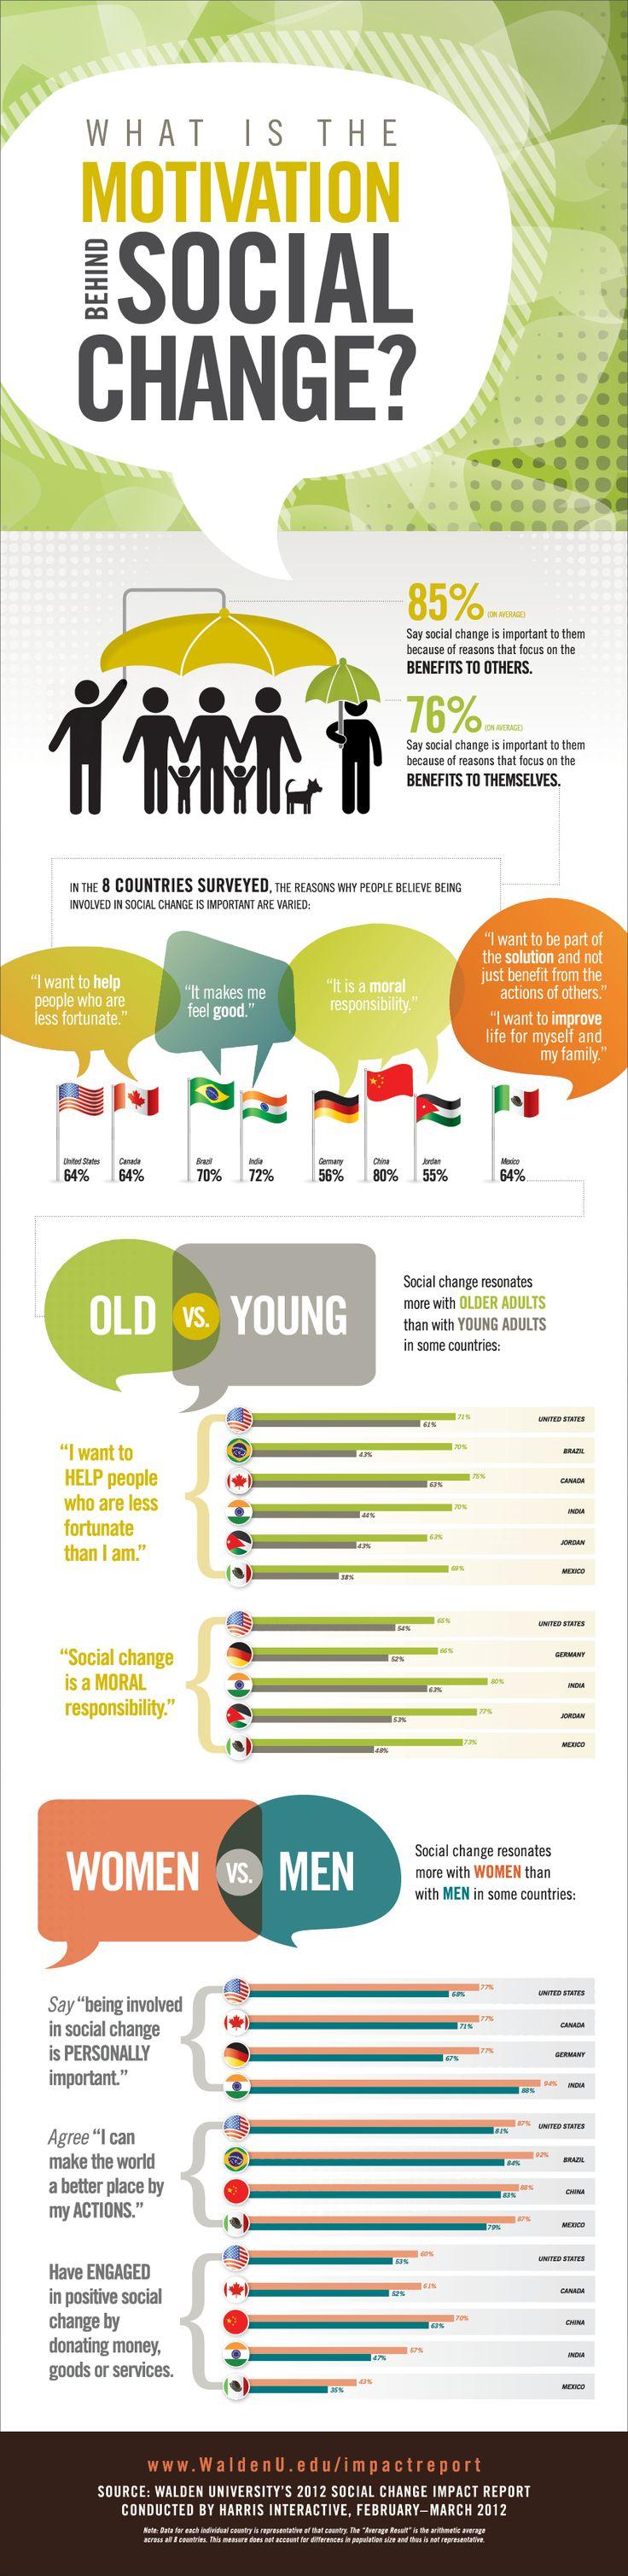 http://www.dailyinfographic.com/what-is-the-motivation-behind-social-change?utm_source=feedburner